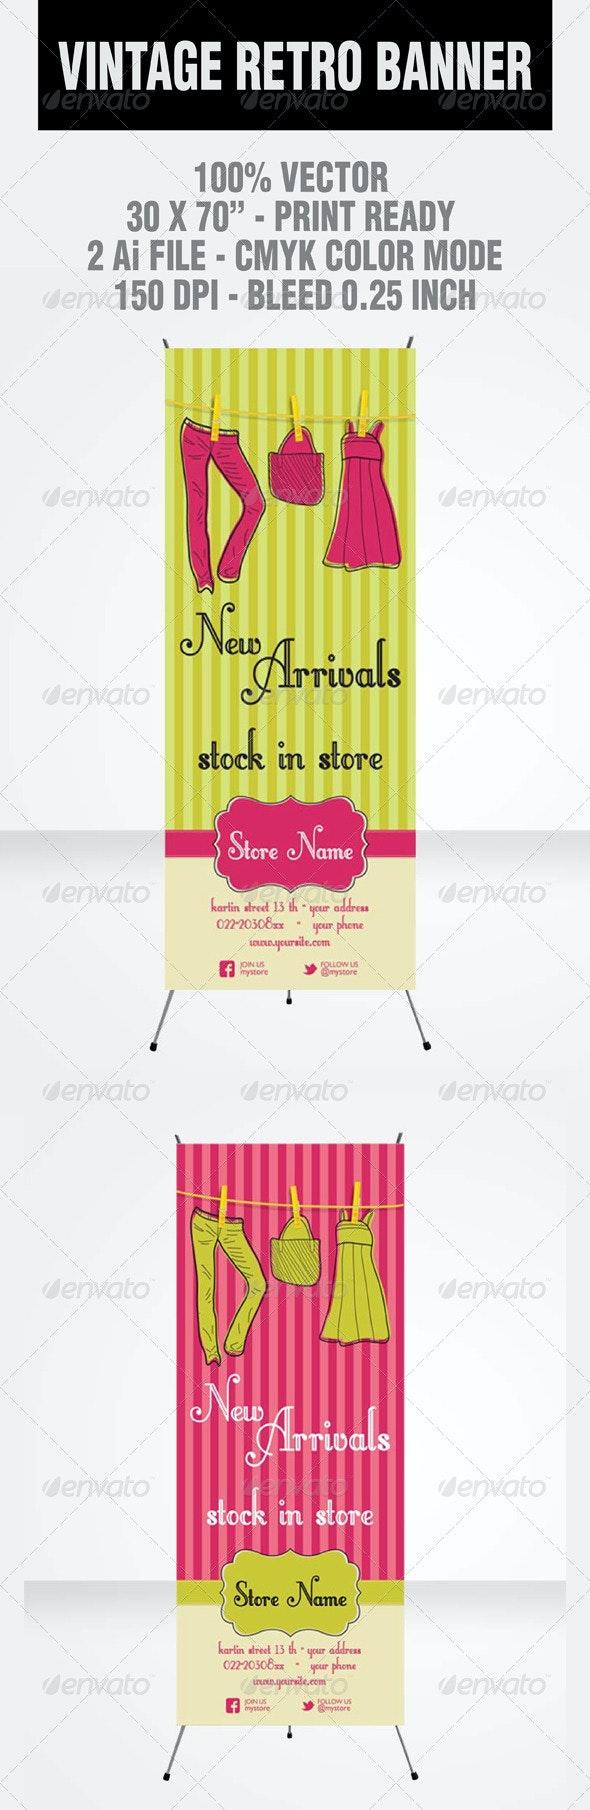 Vintage Retro Banner - Signage Print Templates